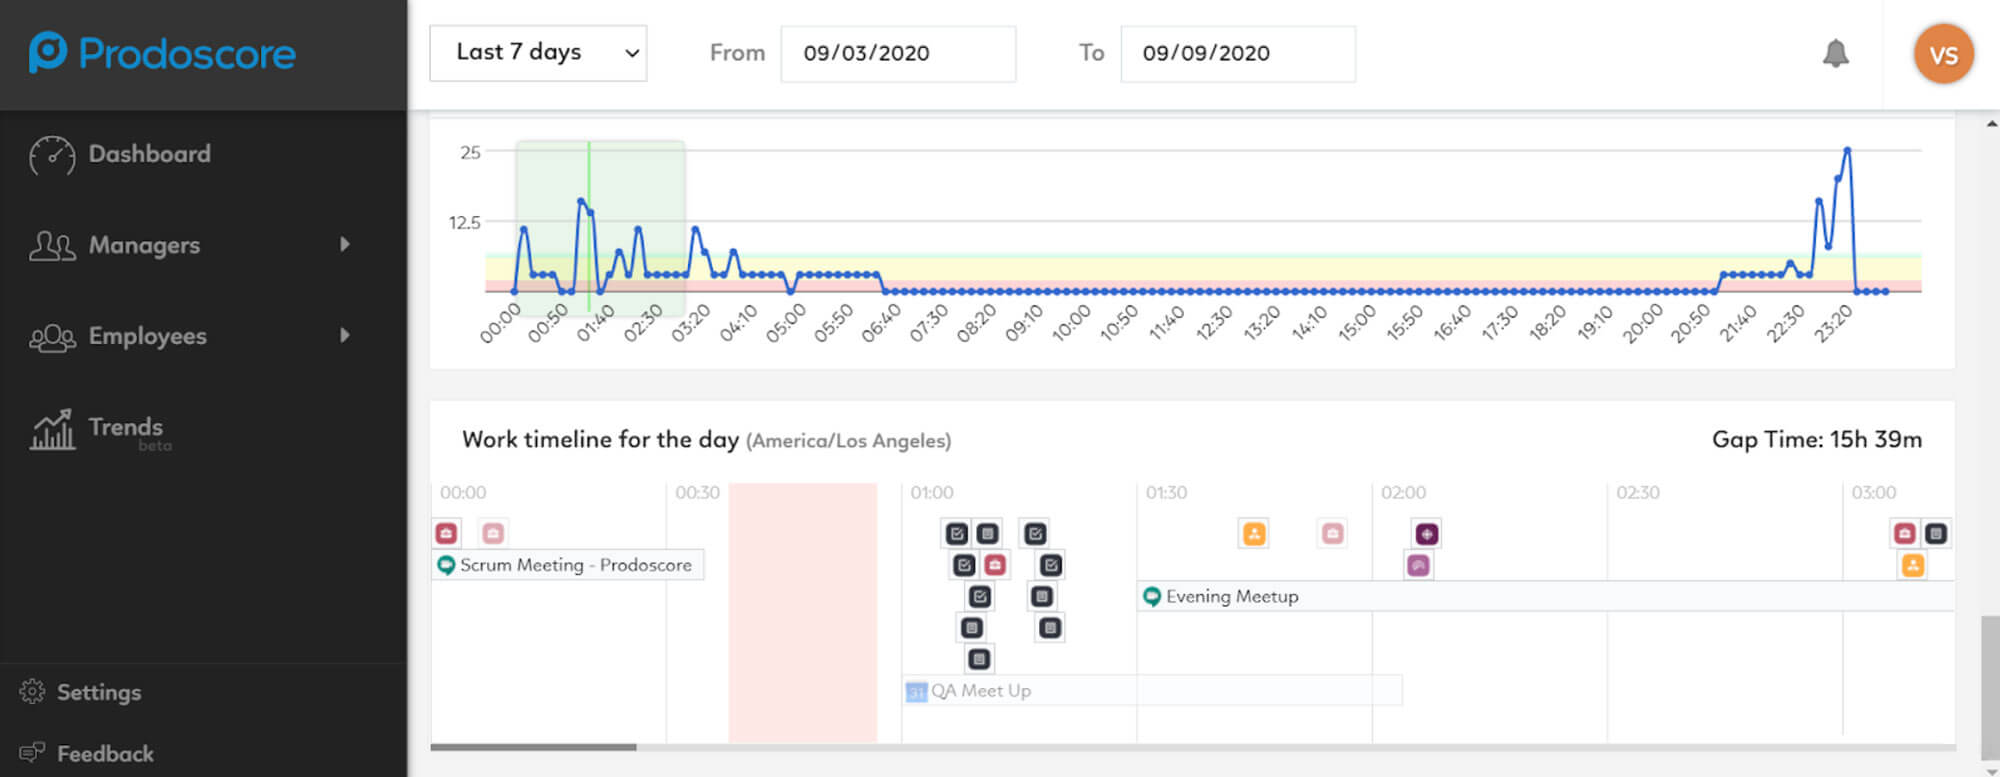 Bullhorn integration timeline on Prodoscore Dashboard